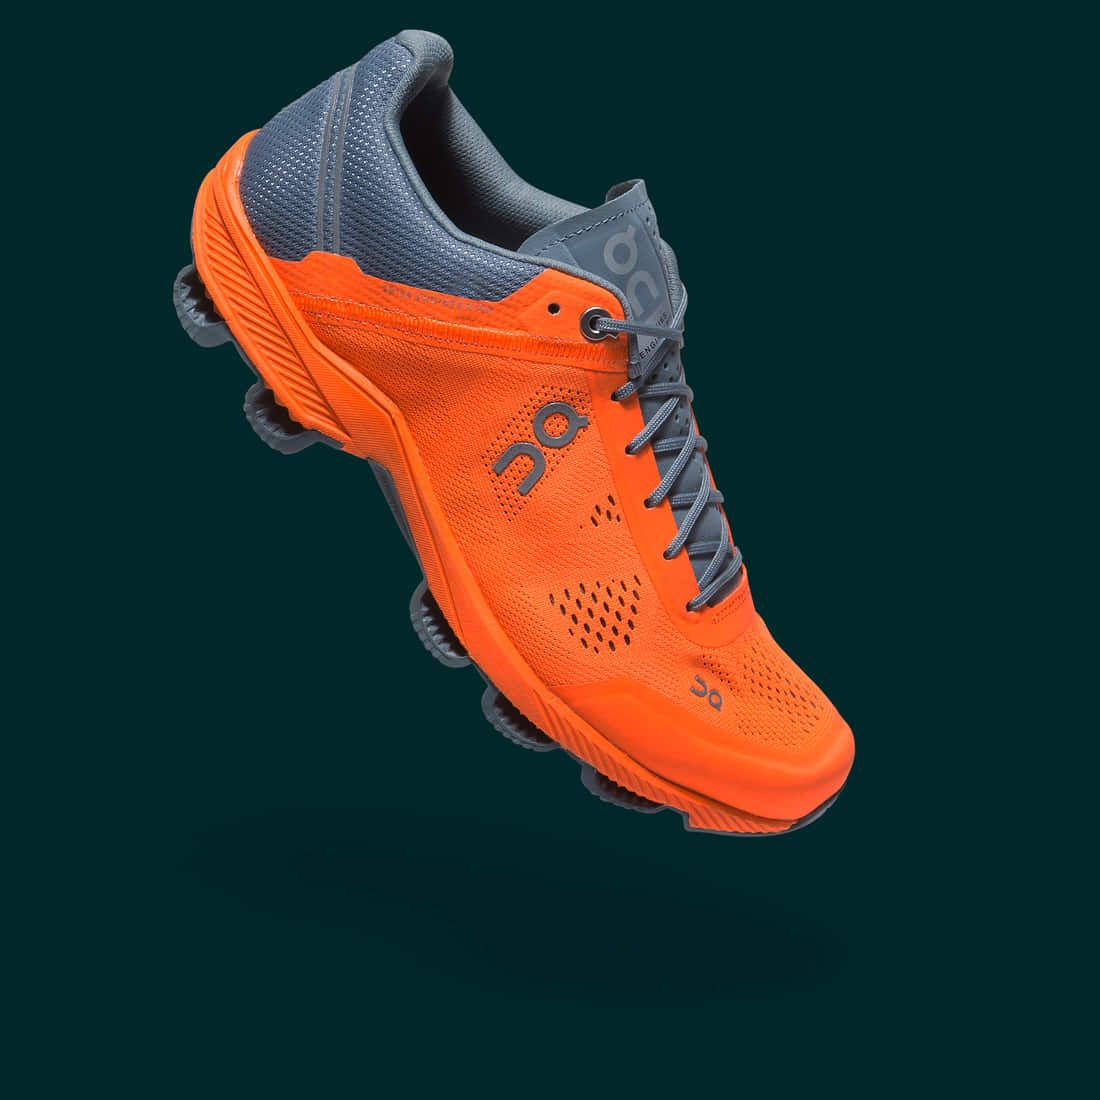 Cloudsurfer - Performance Running Shoe